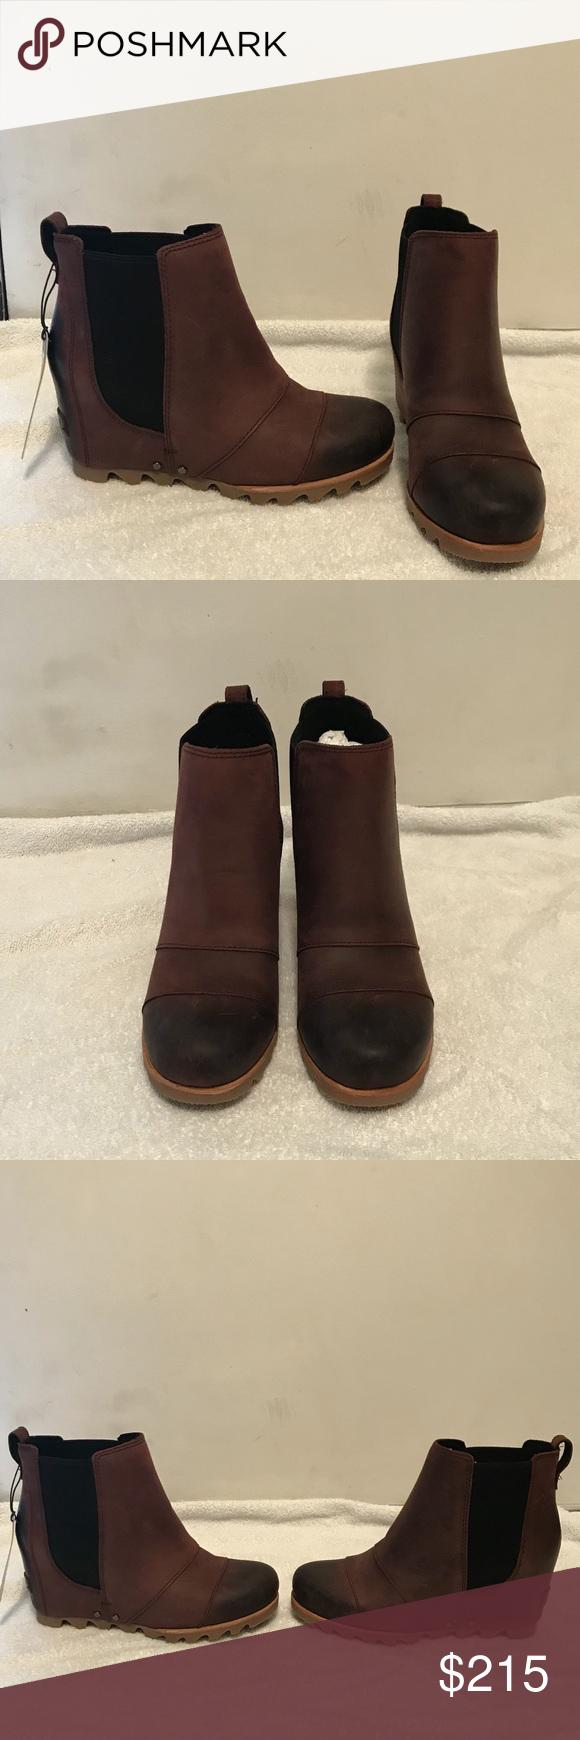 5cd10fa9a61d NIB Sorel Lea Wedge New in box! Sorel Lea Wedge. Size 9. Sorel Shoes Winter    Rain Boots